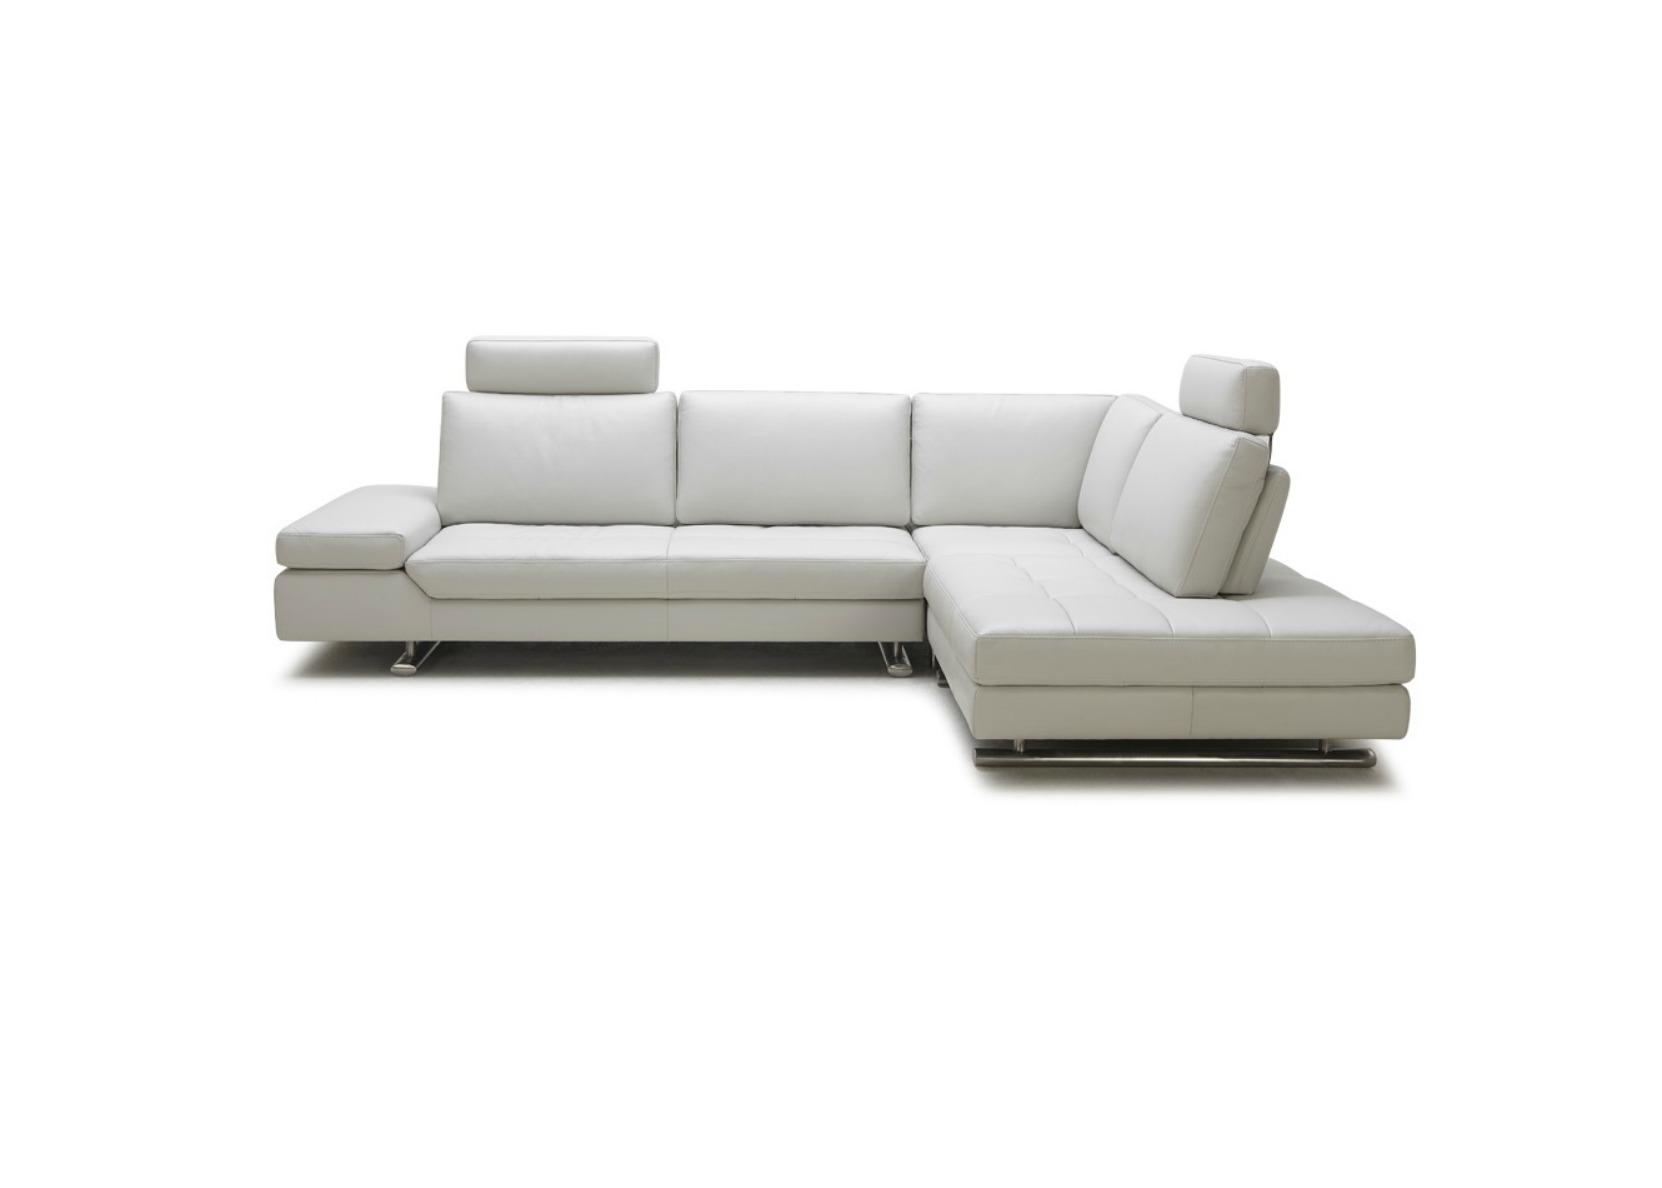 Backrests For Beds Sofa Bed Large Filled Triangular Wedge